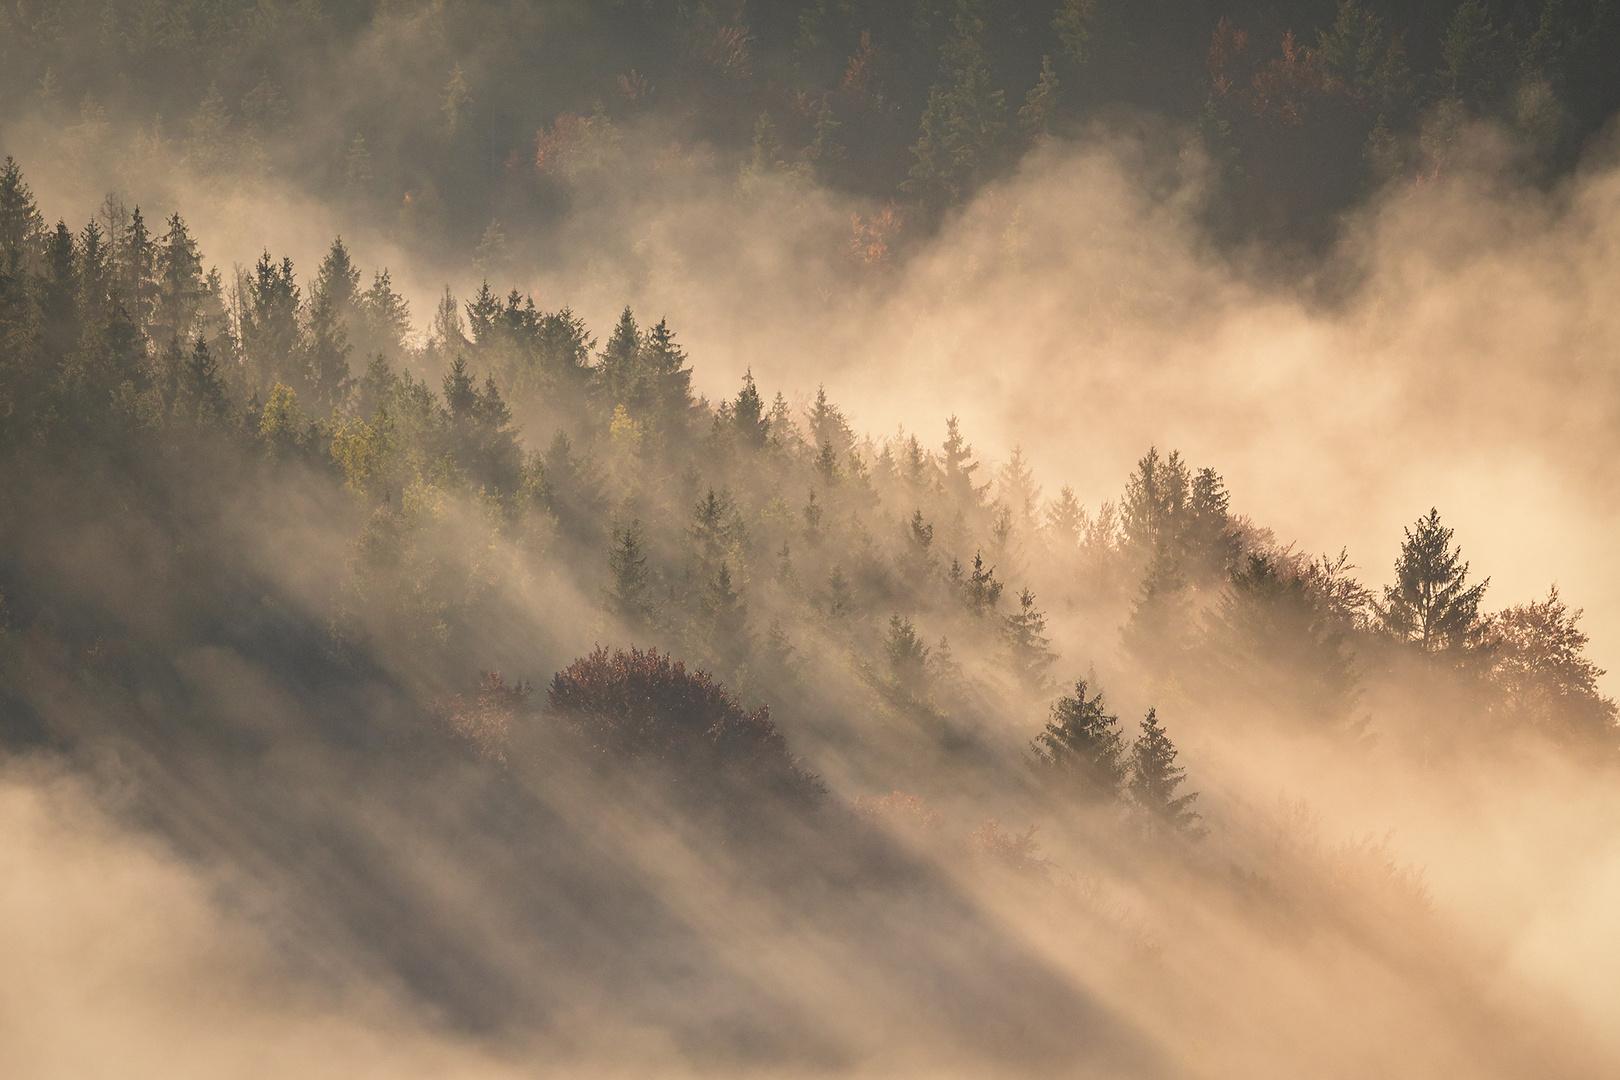 Goldene Sonnenstrahlen durchschneiden den Nebel